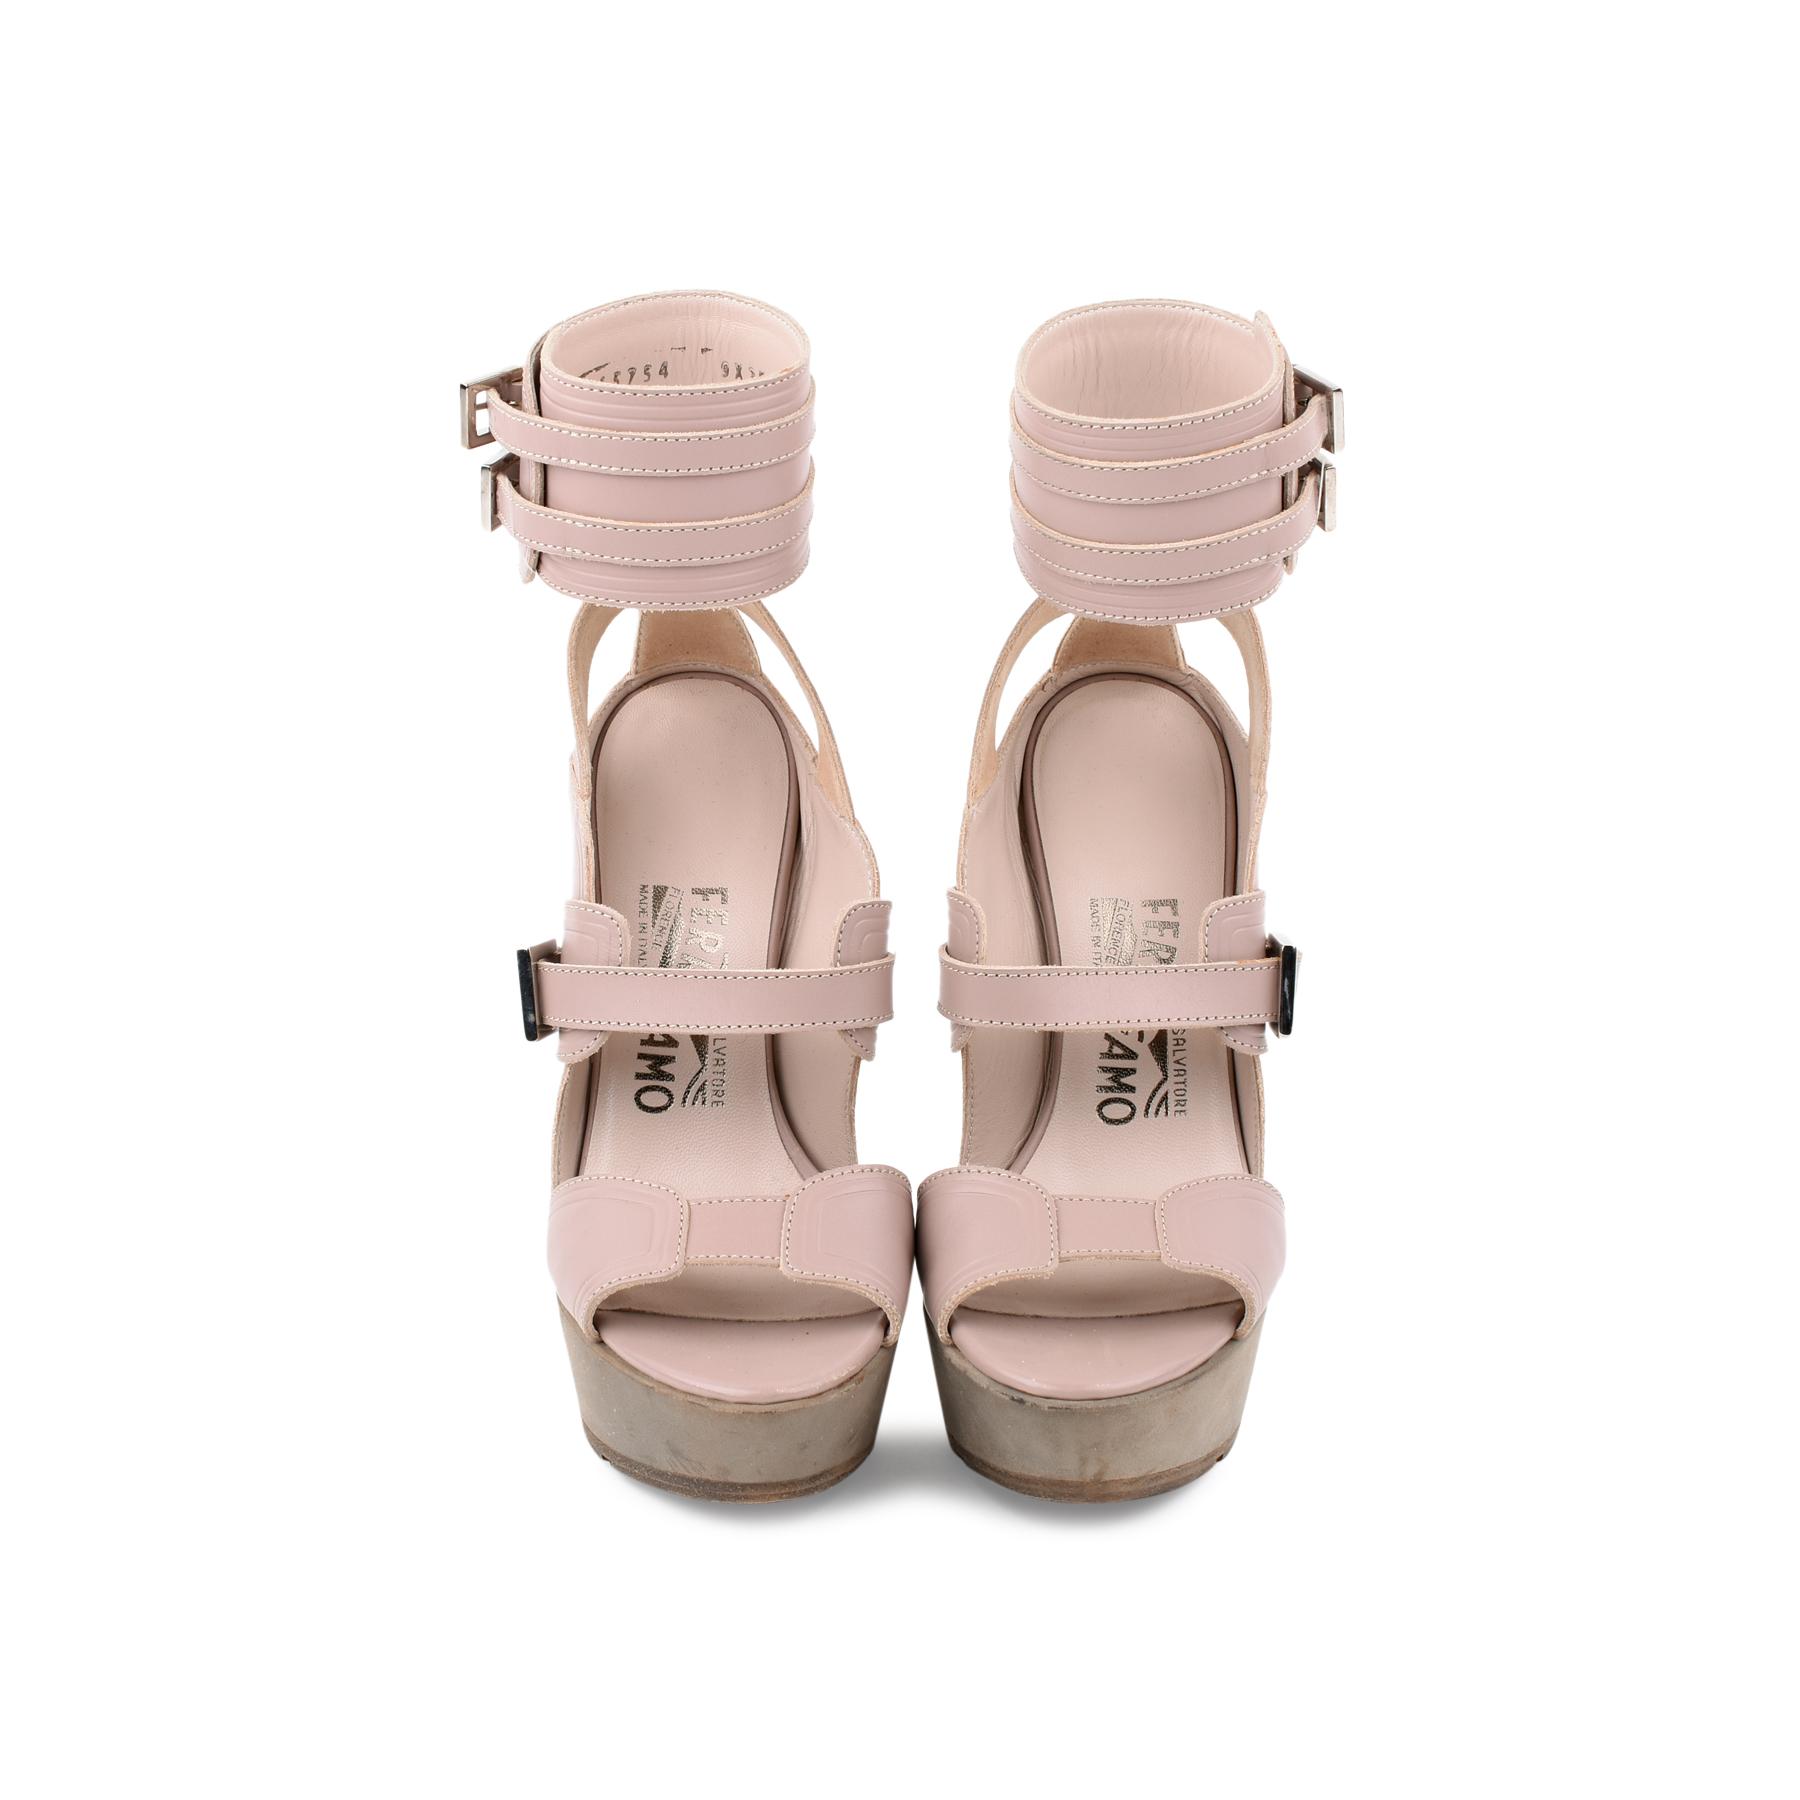 8039ed5b541860 Authentic Second Hand Salvatore Ferragamo Braided Platform Sandal  (PSS-080-00221)